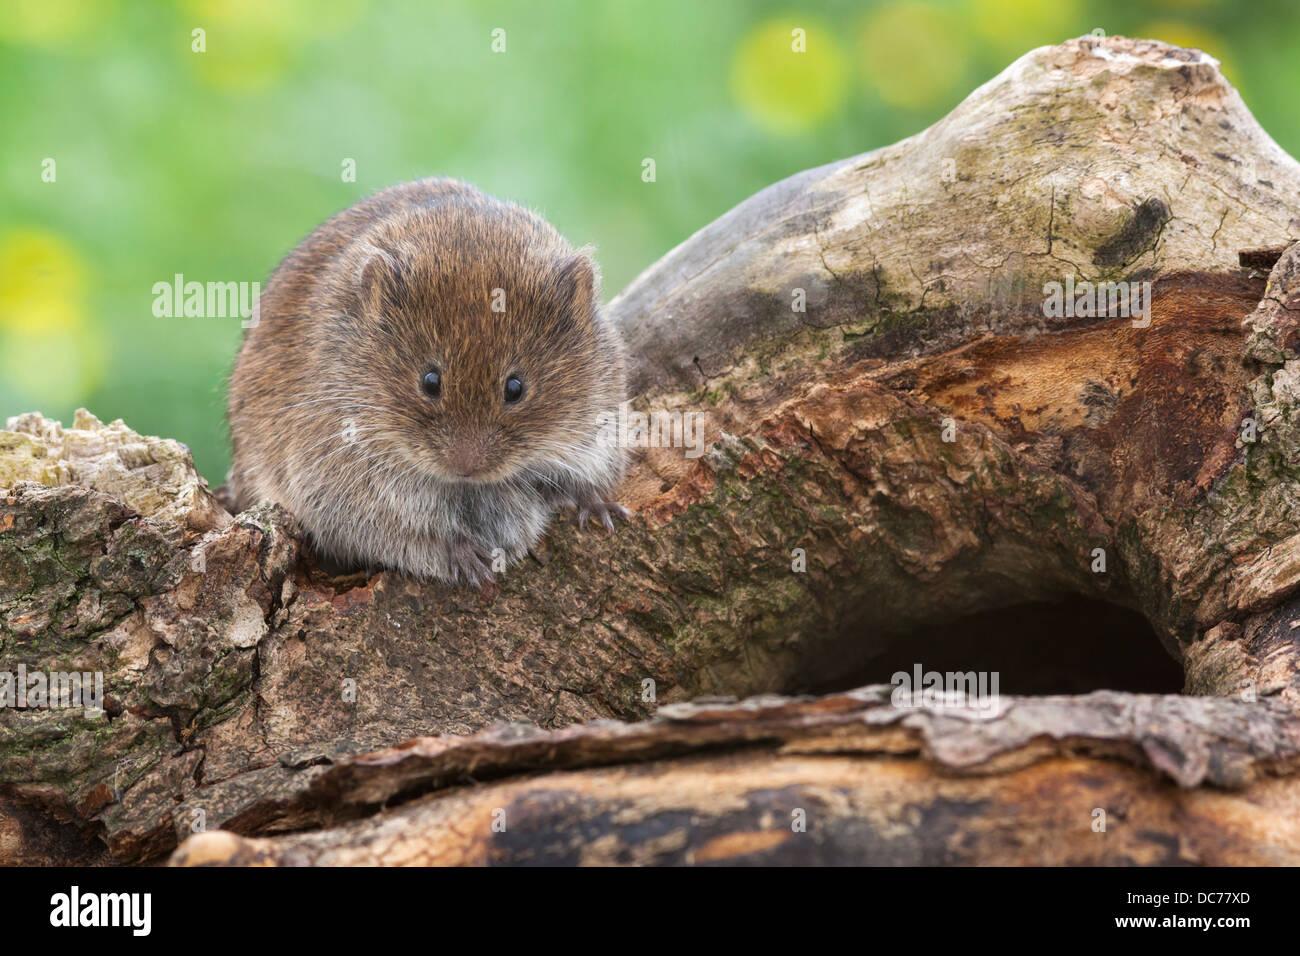 Field vole (Short-tailed vole) (Microtus agrestis), captive, UK, June 2013 - Stock Image